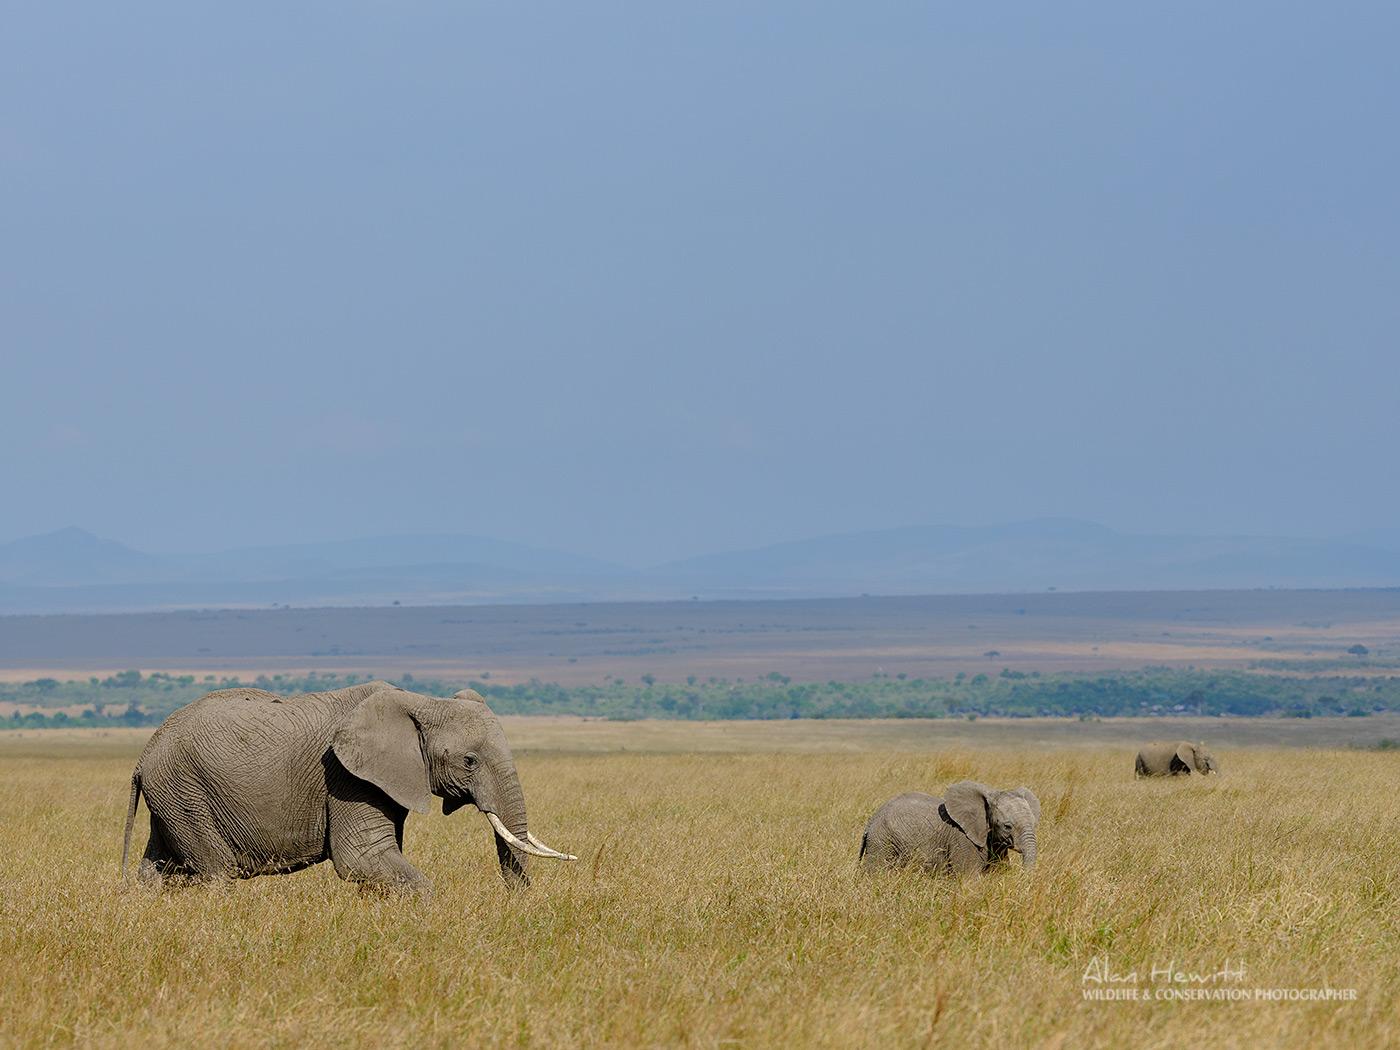 Elephants – Fujifilm GFX50s & GF250mm Alan Hewitt Photography